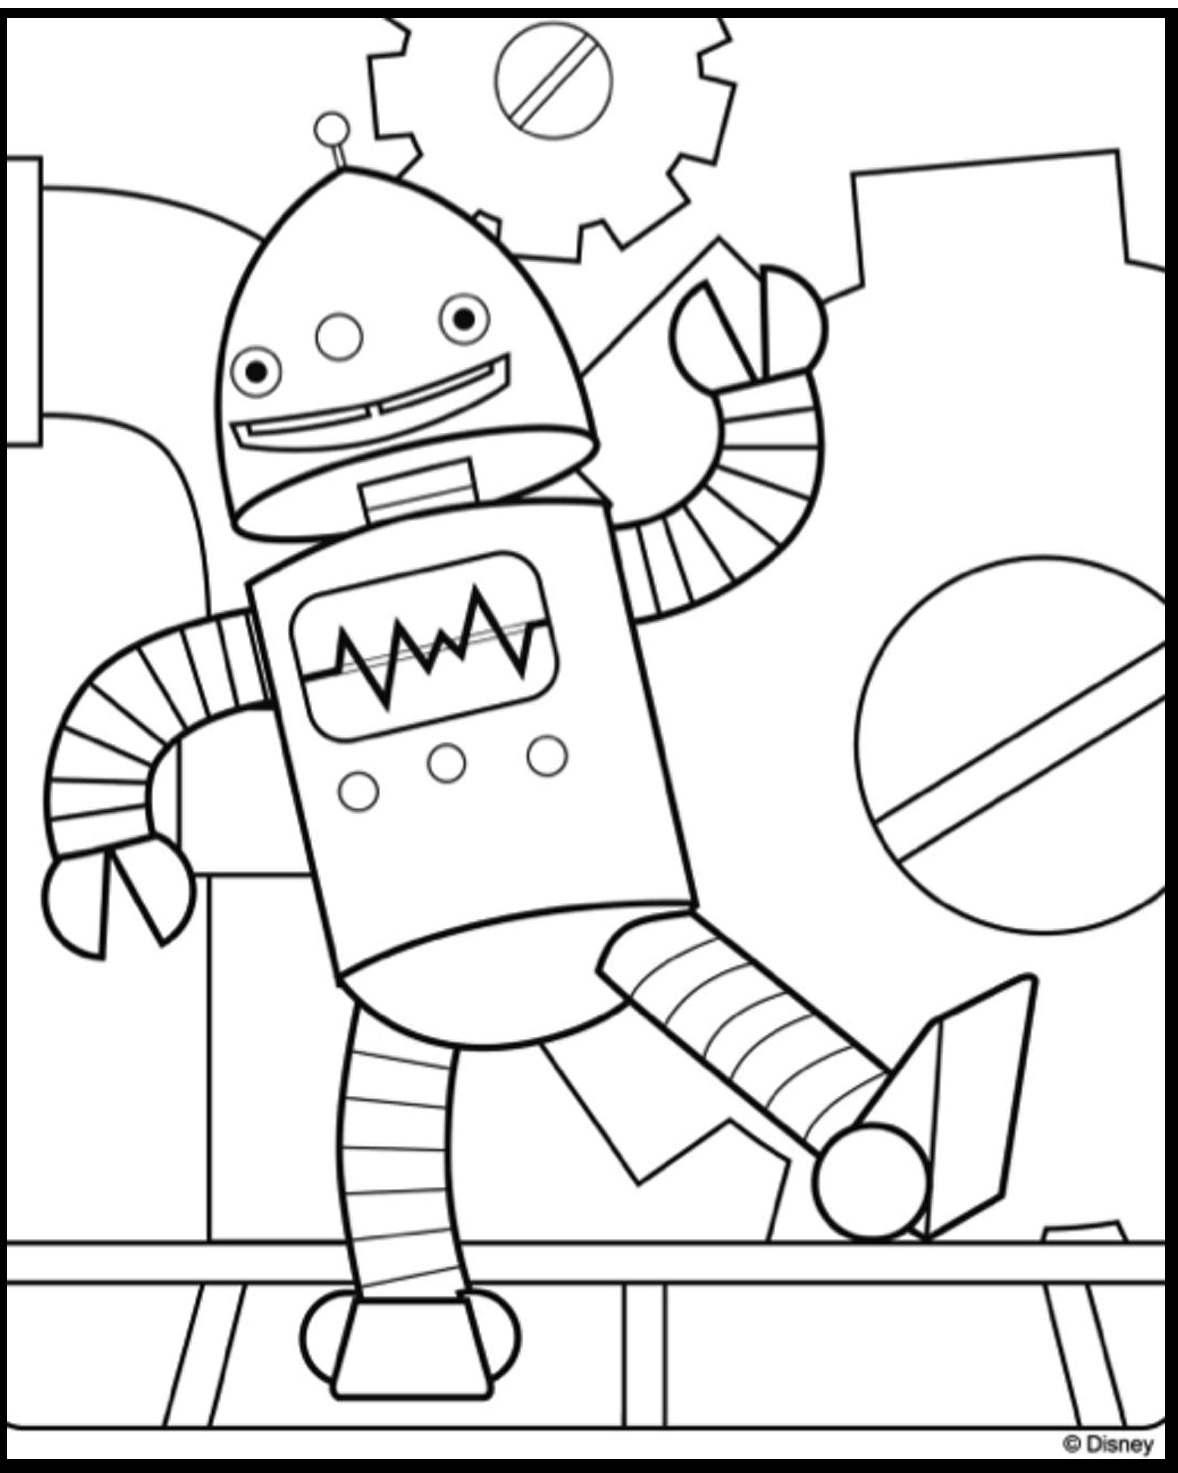 The Art & & Science of ROBOTICS (3)